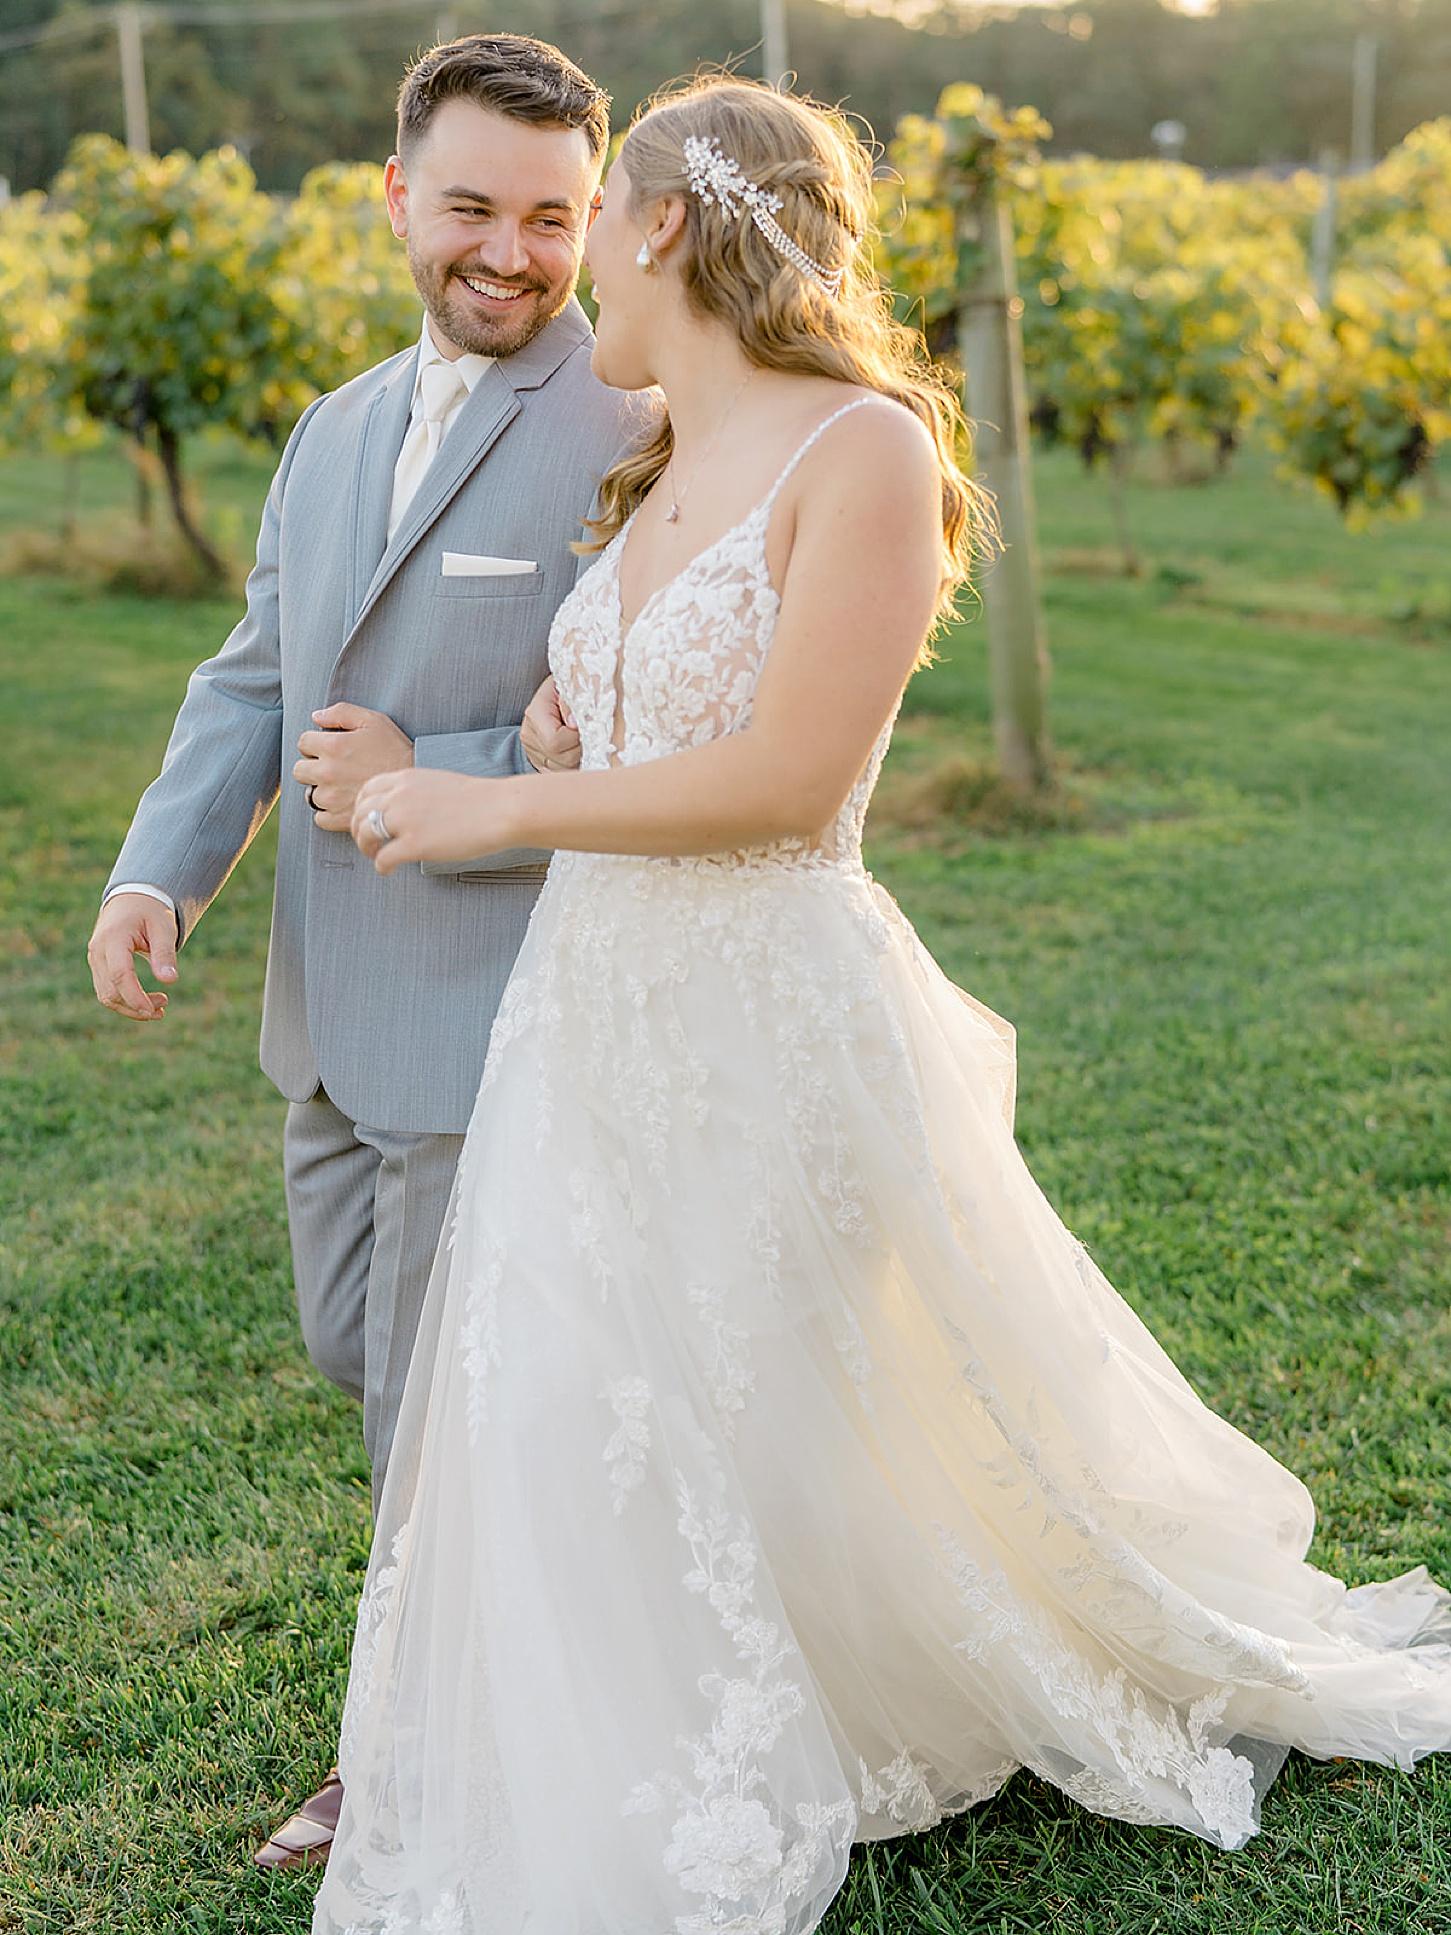 Valenzano Winery Vitners Pavillion Wedding Photography by Magdalena Studios 0037